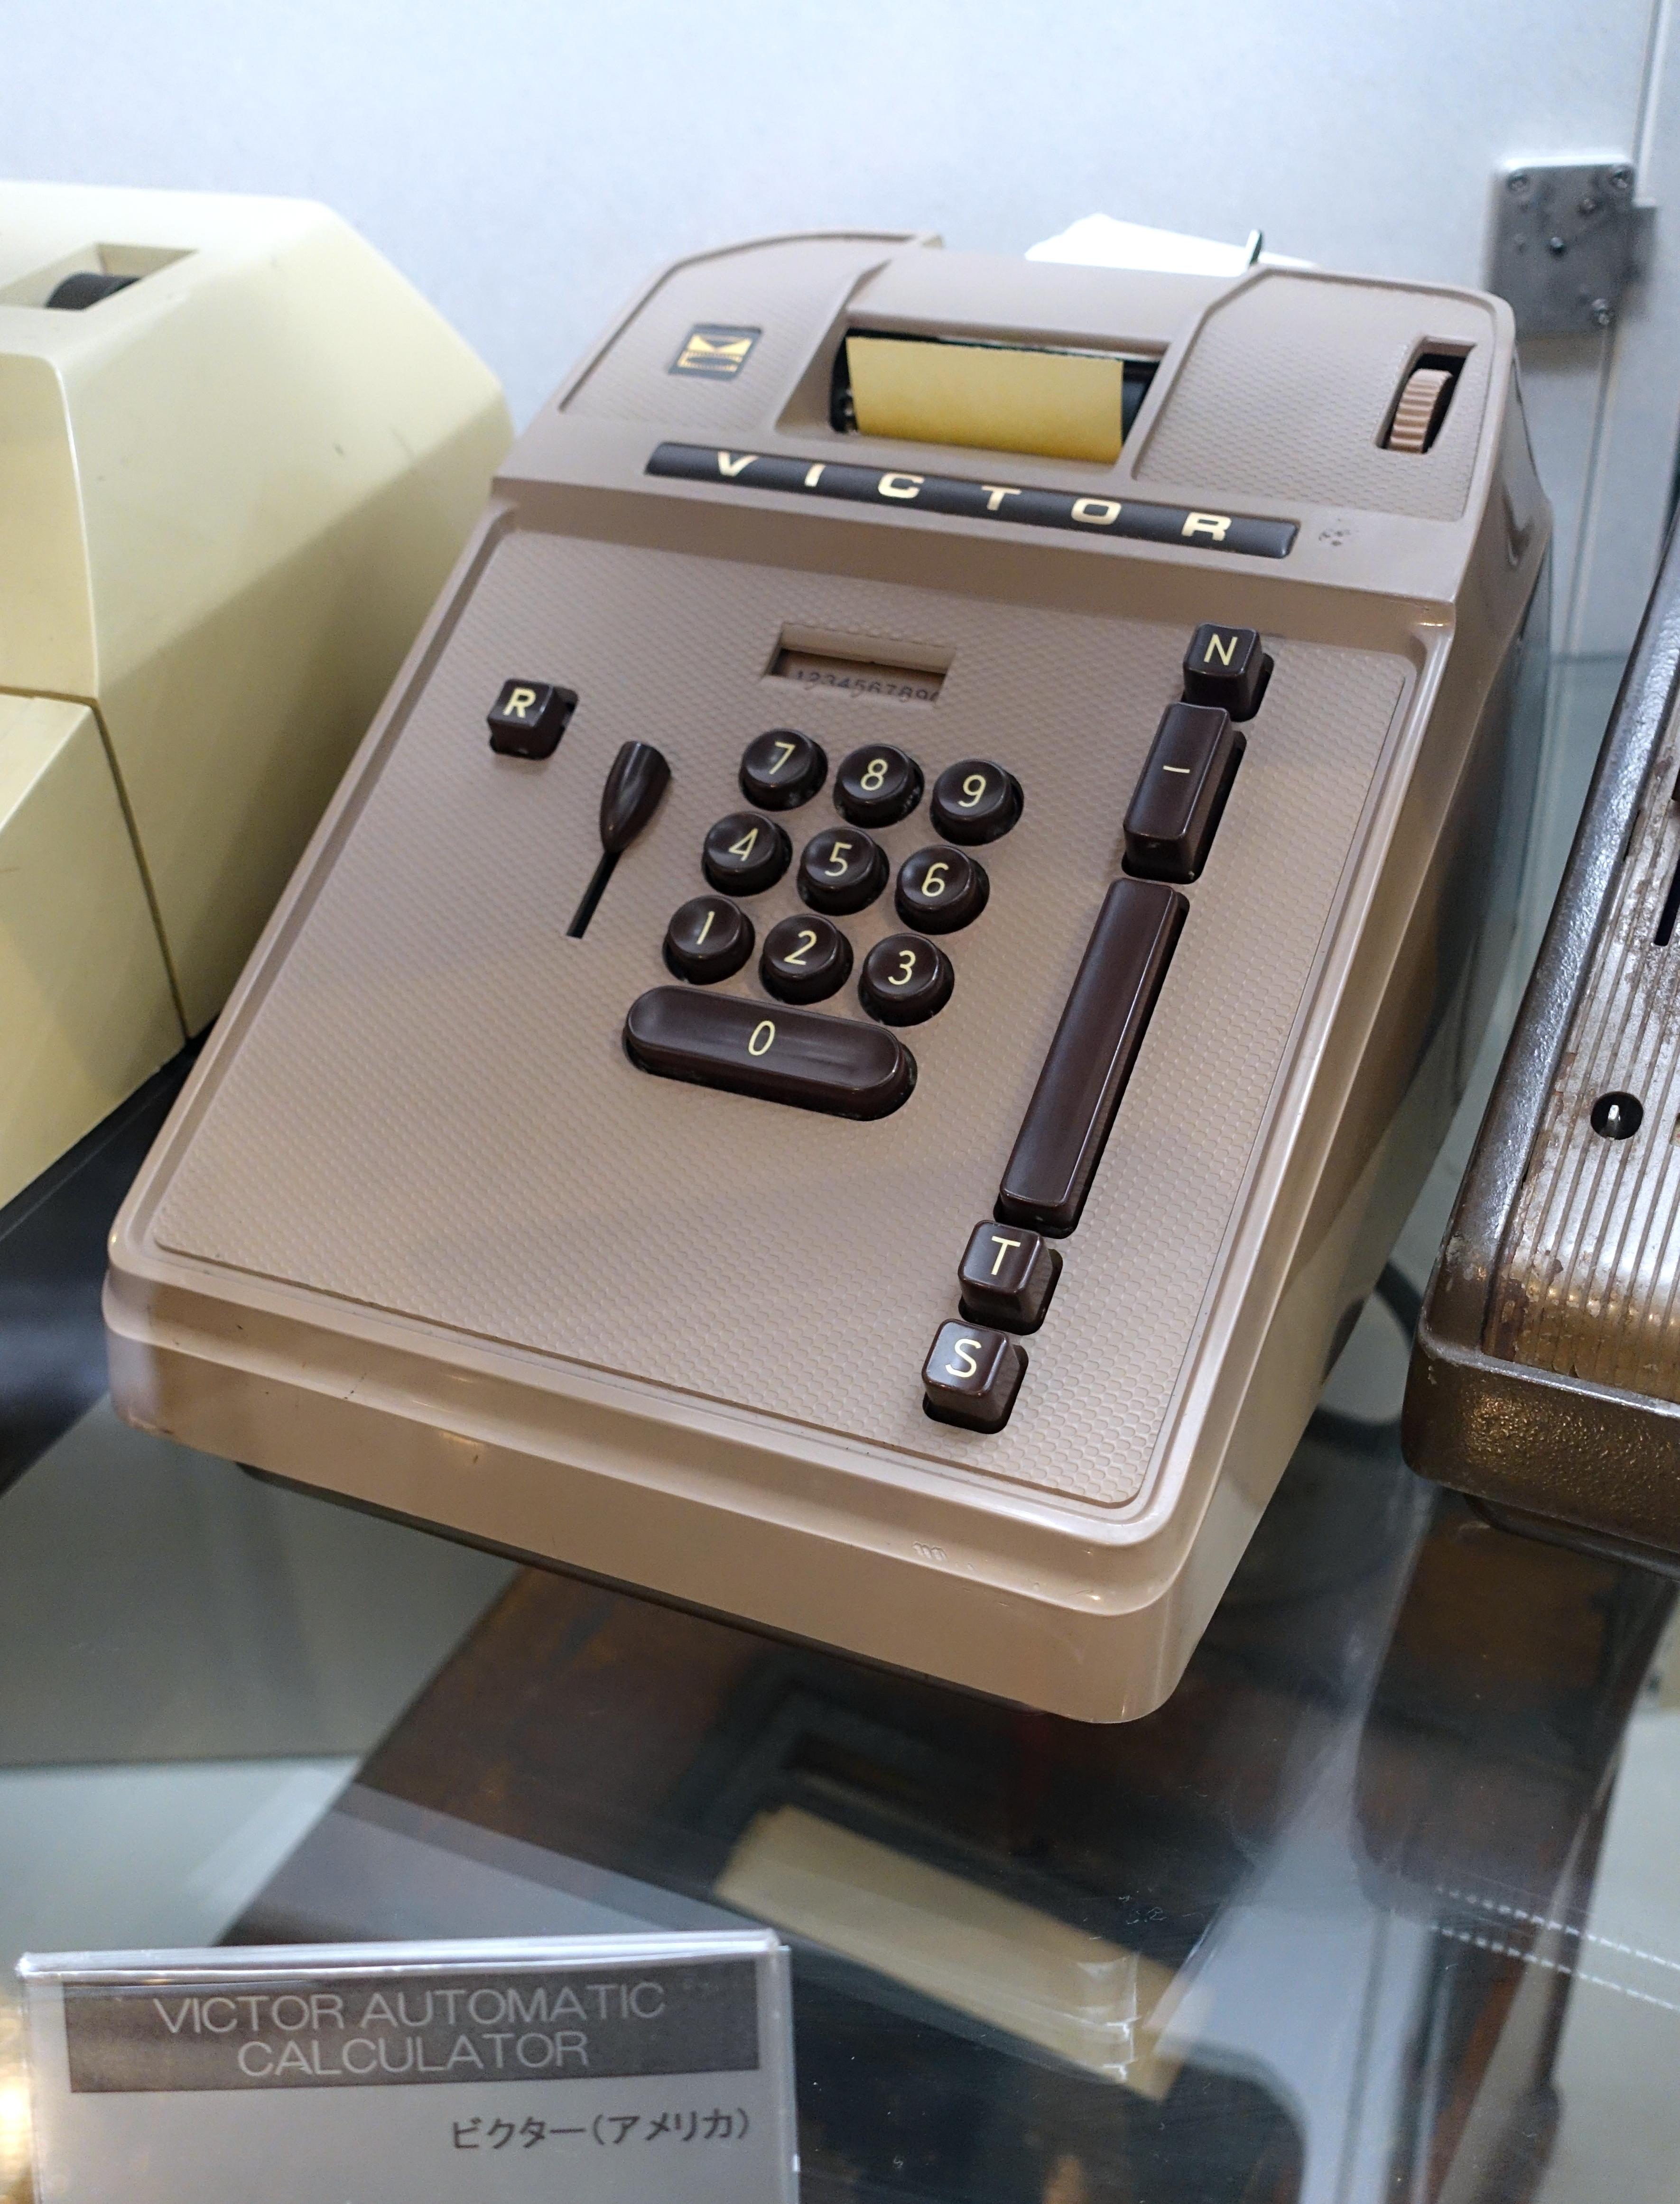 File:Victor Automatic Calculator electromechanical adding